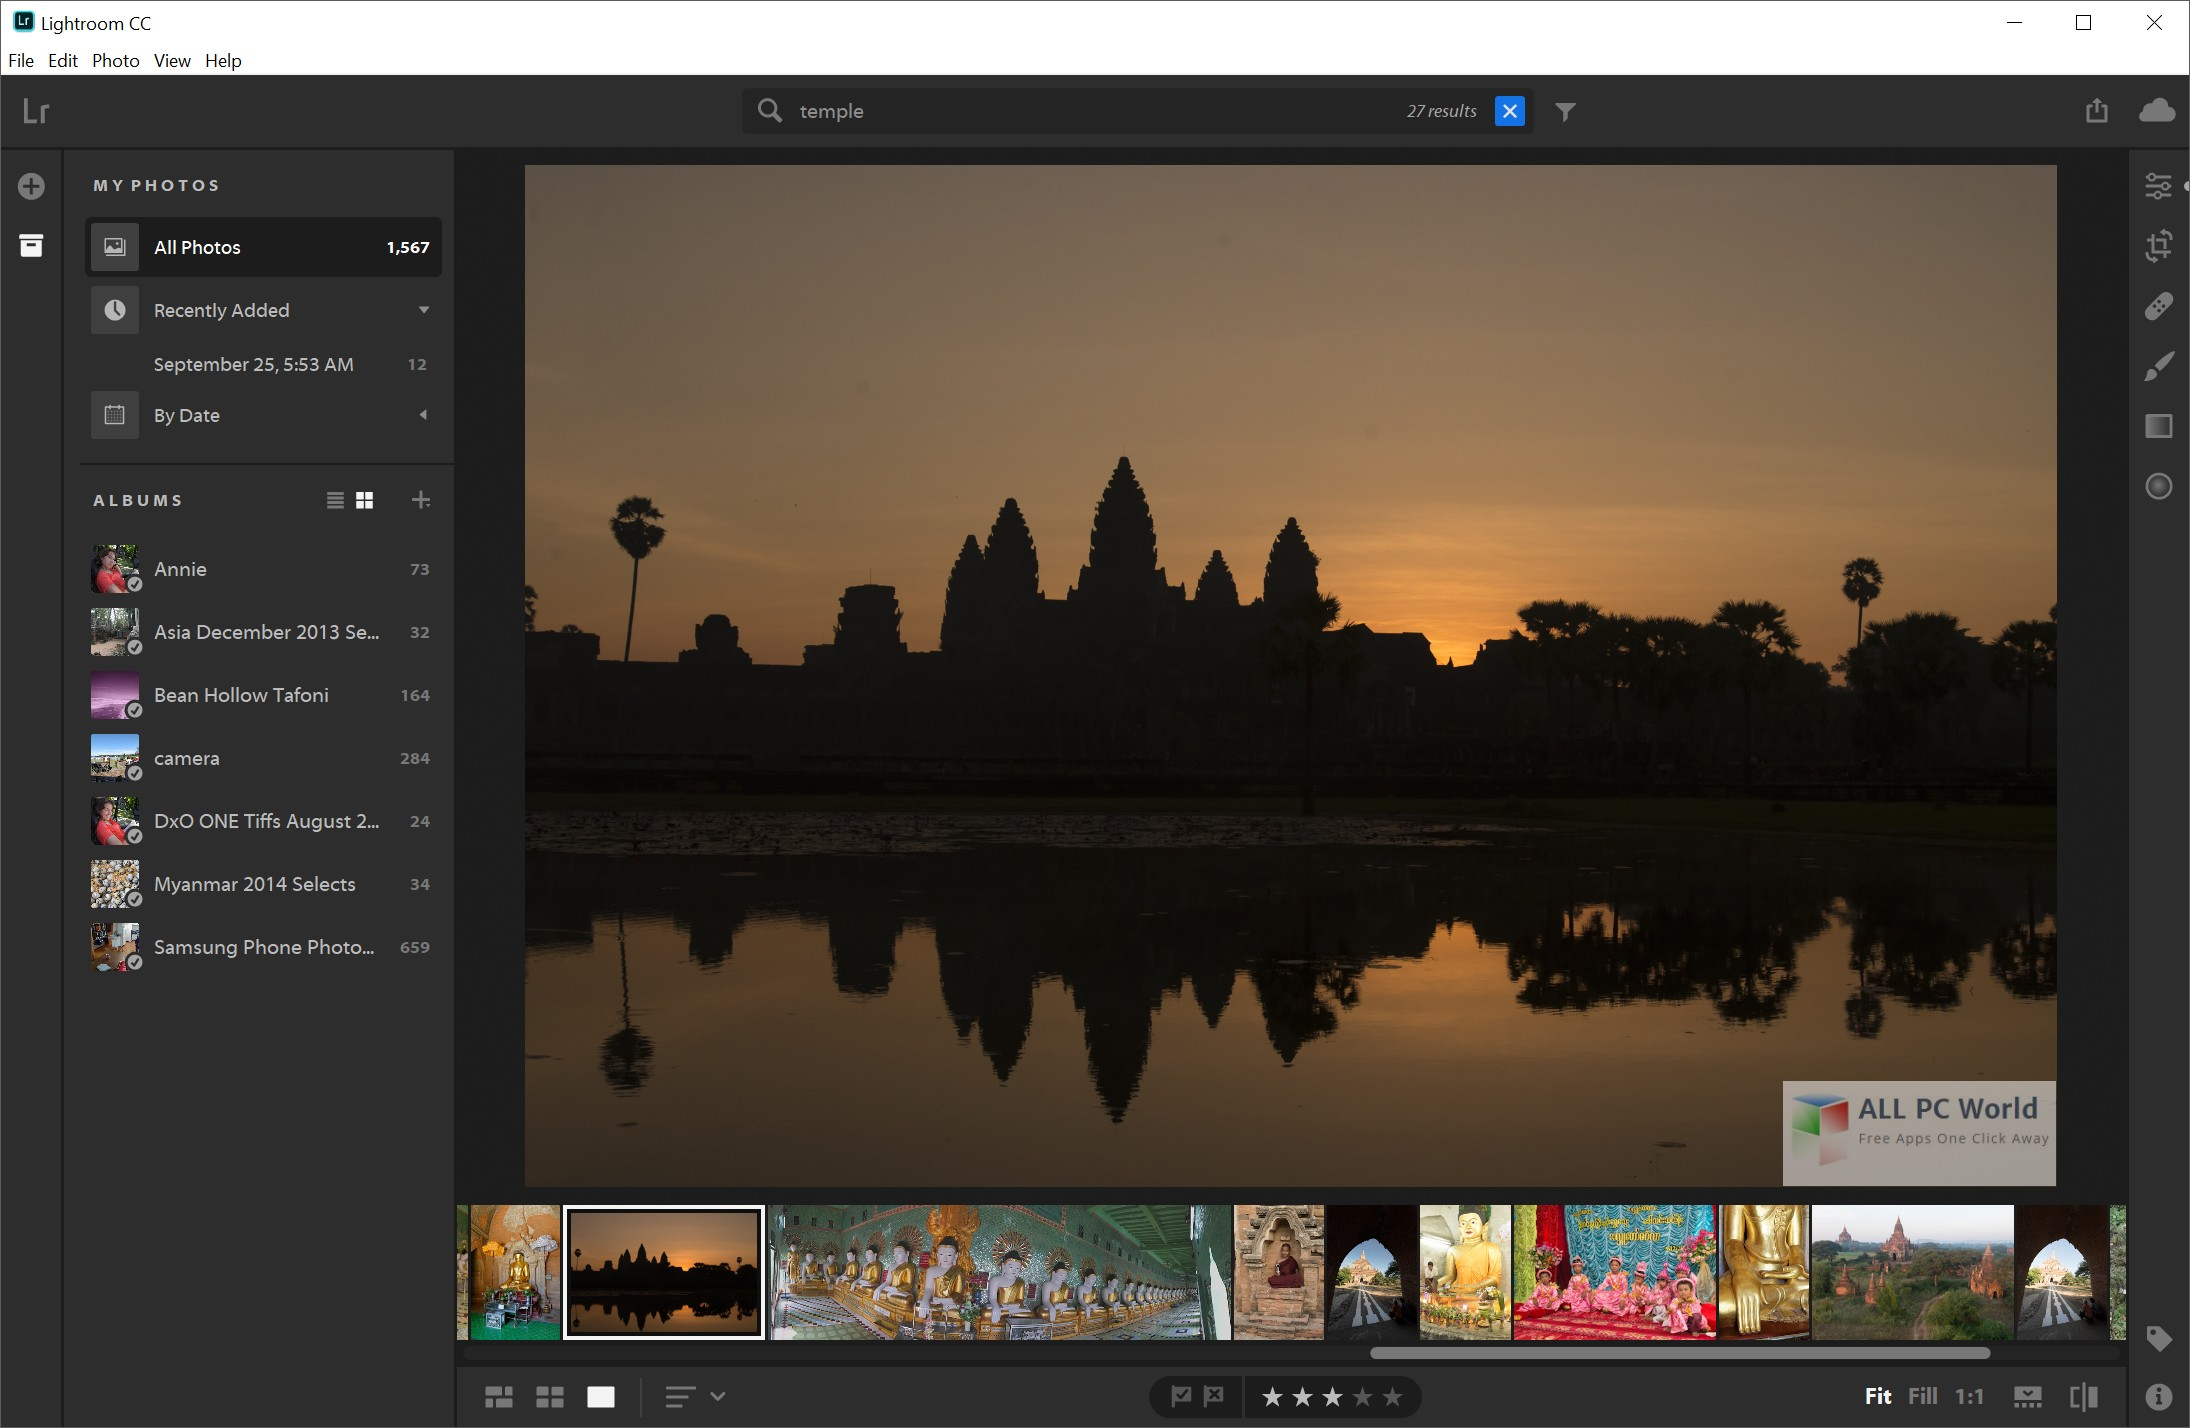 Portable Adobe Photoshop Lightroom CC 1.0 Review